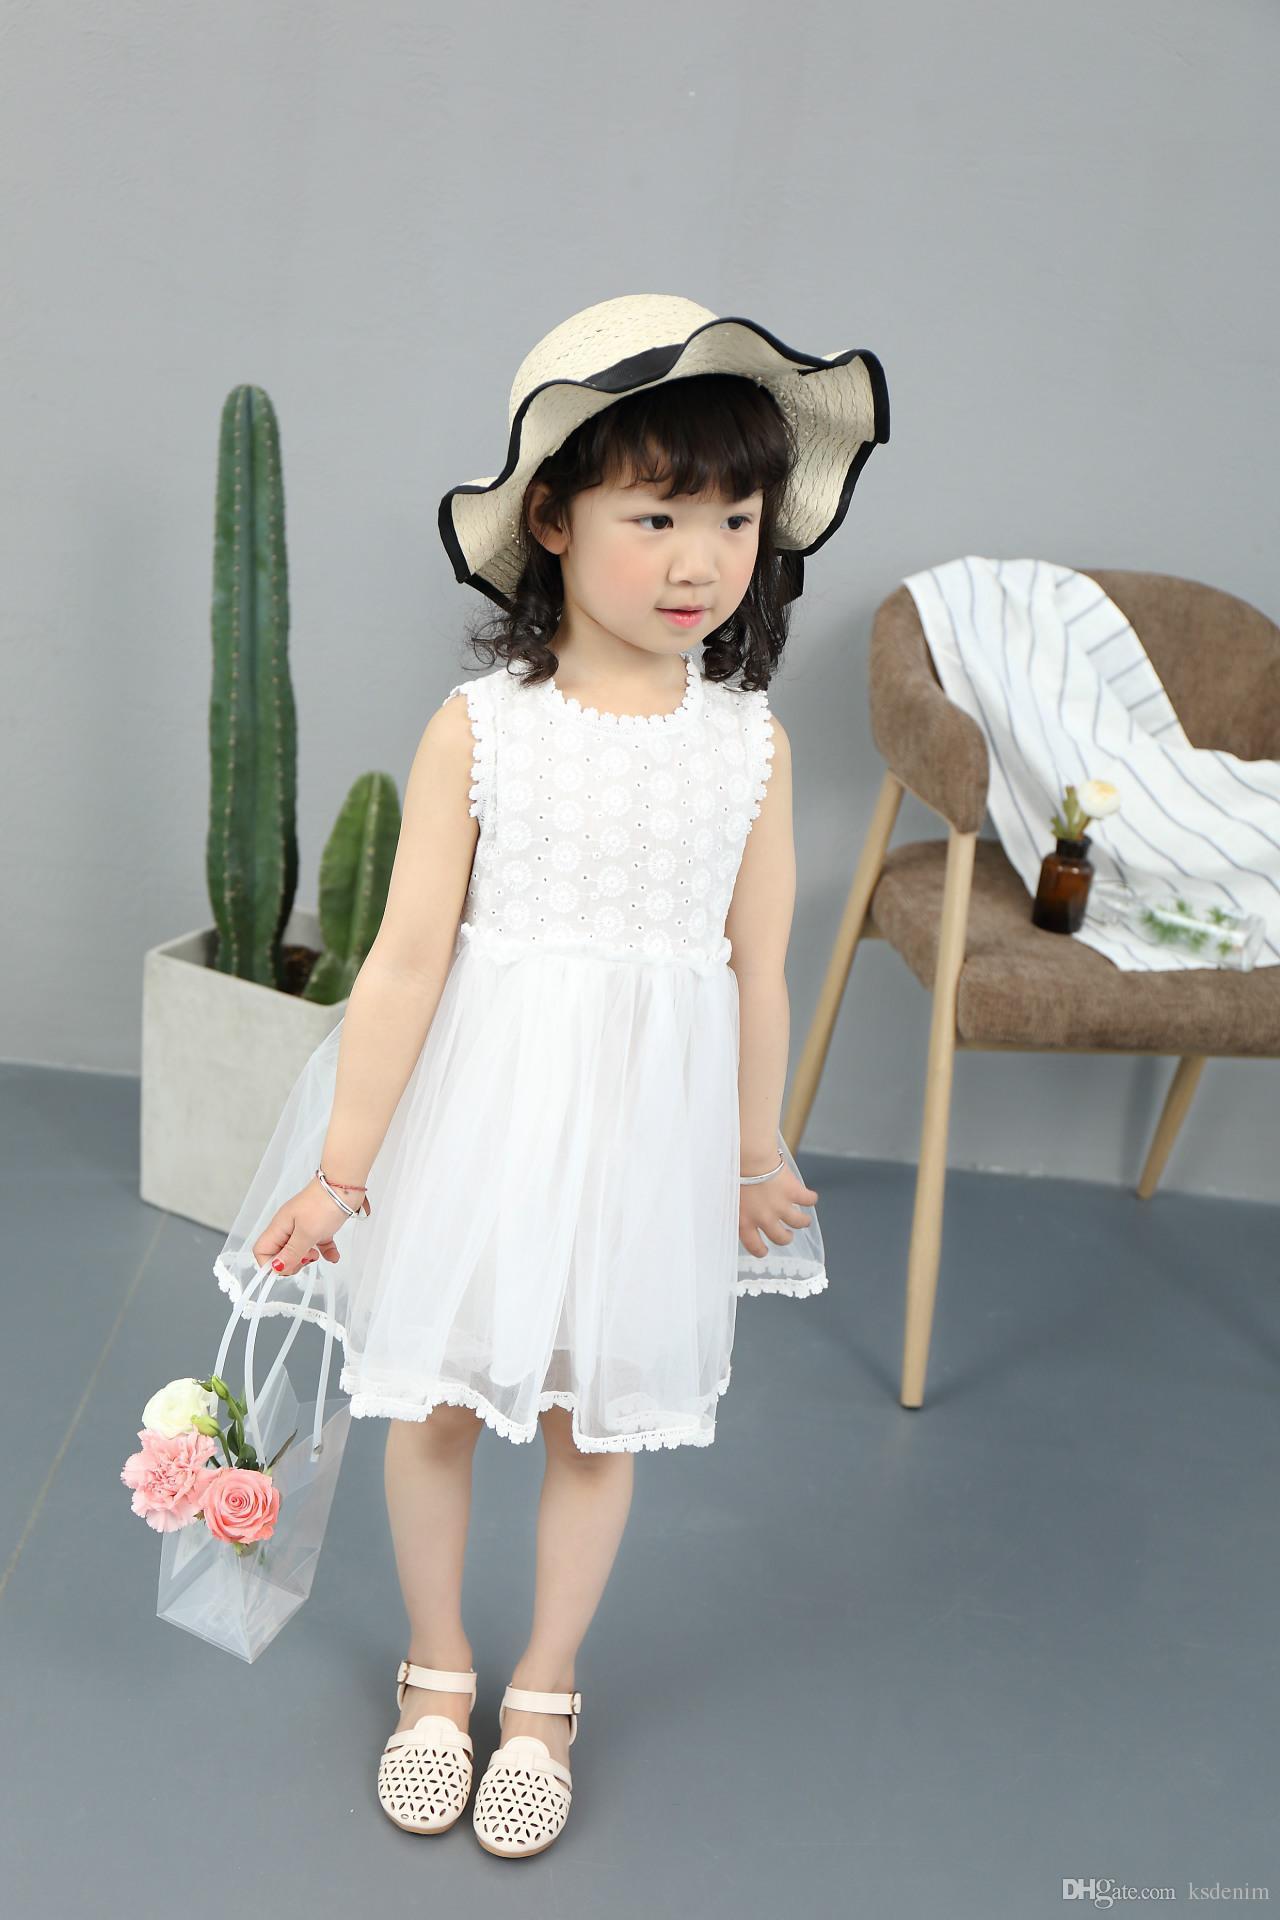 Fashionable girl photo